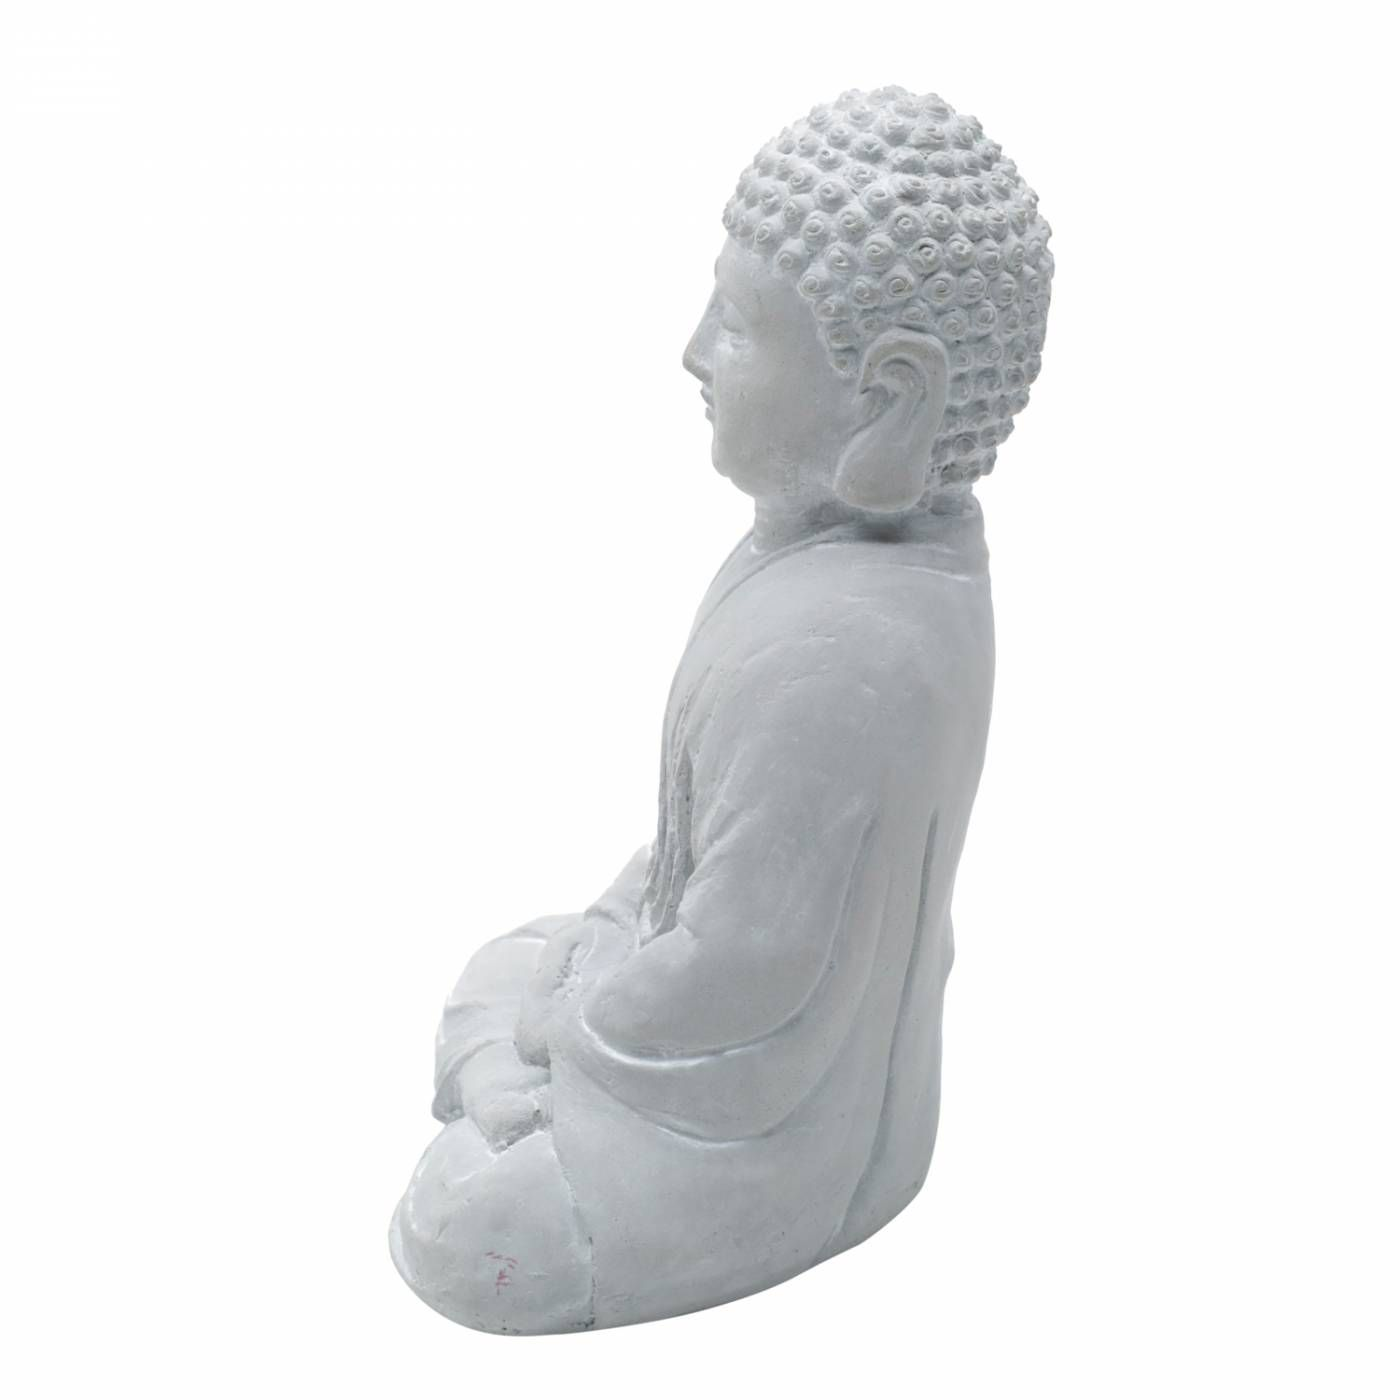 Buda Hindu Namastê Tibetano Sidarta Cimento Queimado